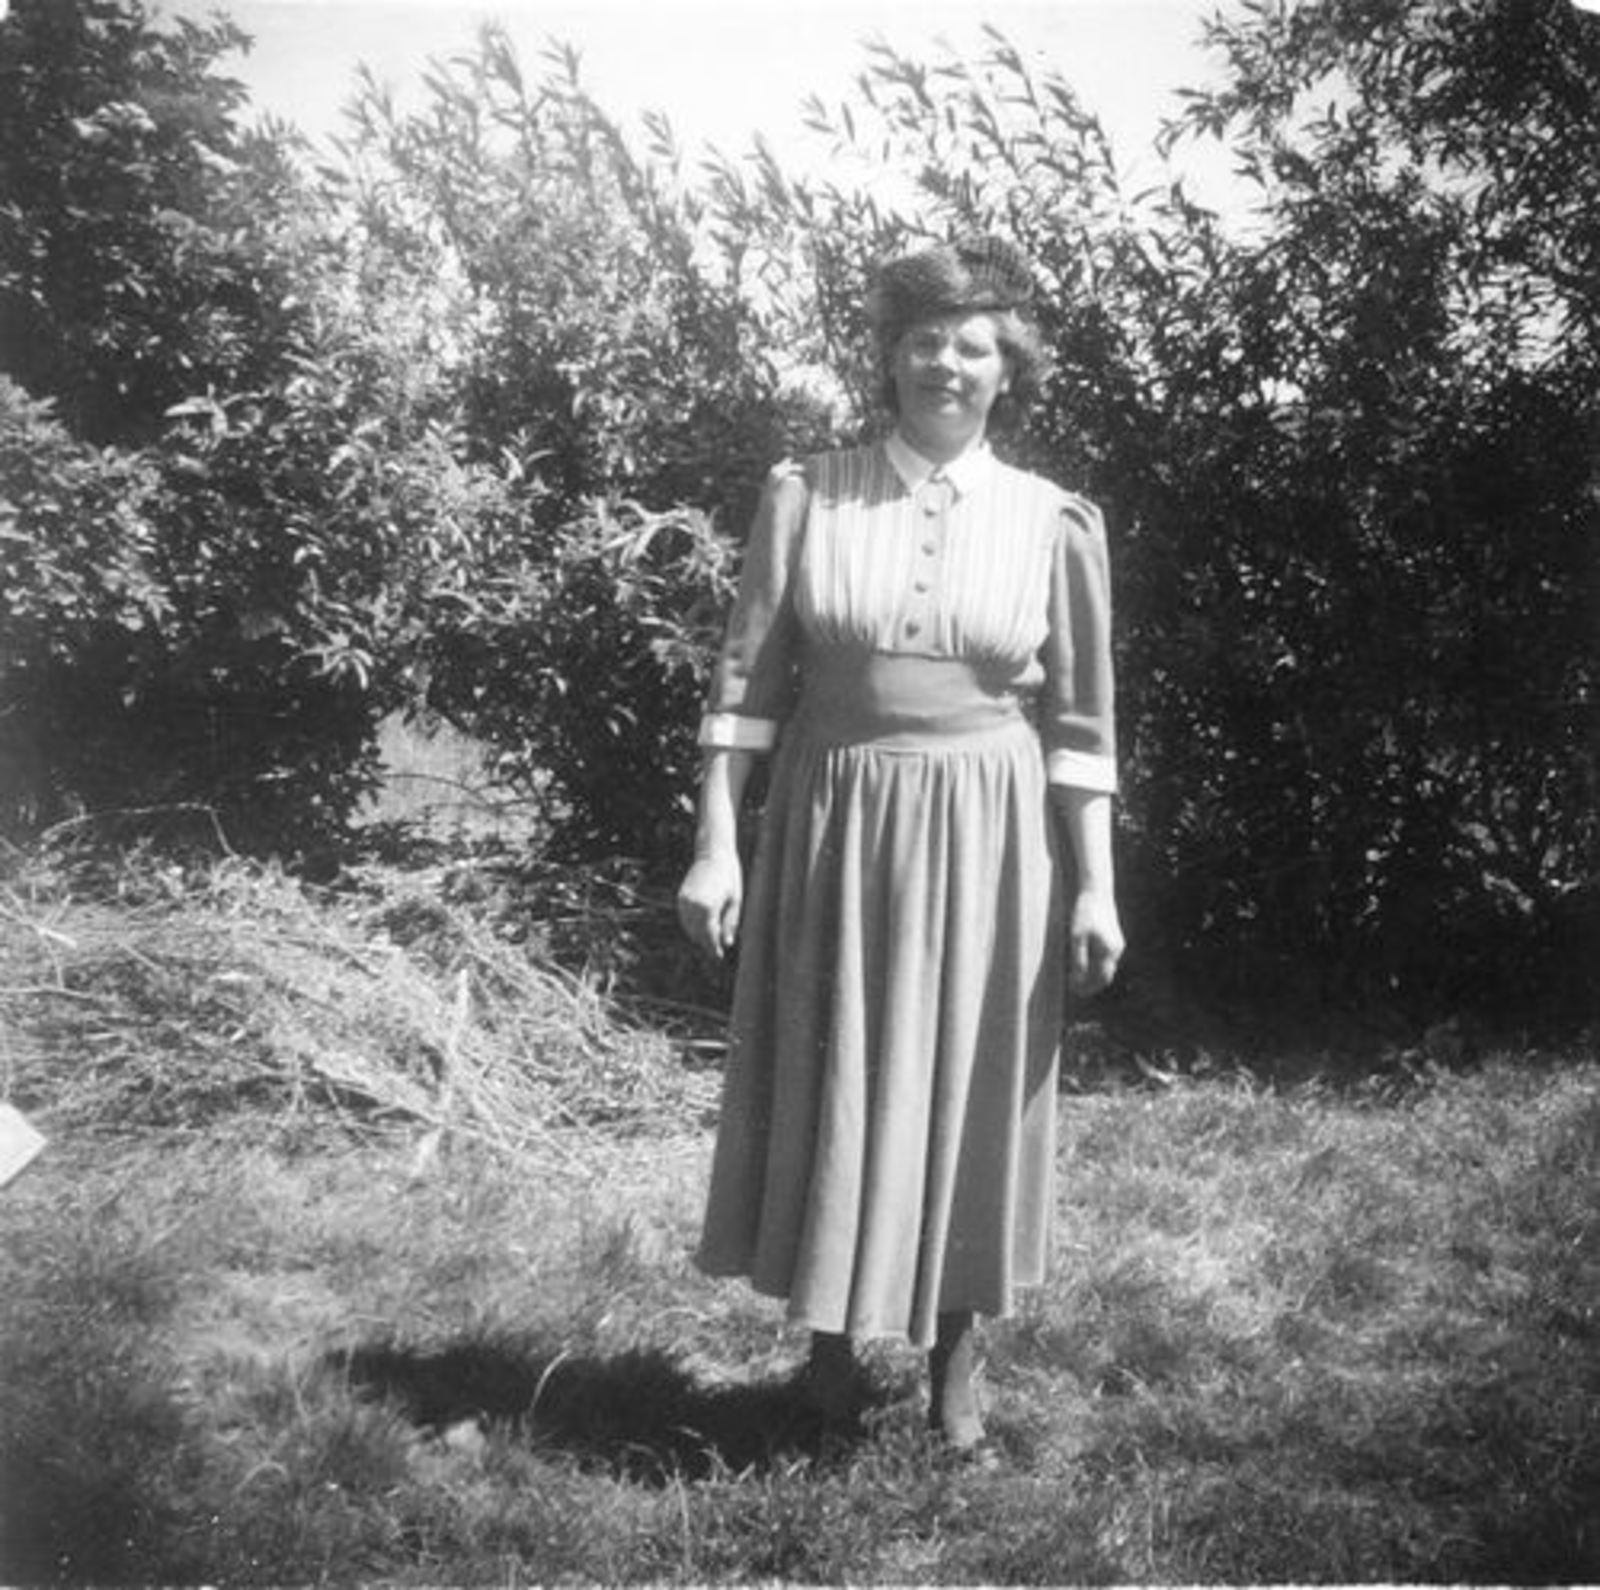 Koeckhoven Therus Janzn 1899 1950 vrouw Bep Adriaanse in Tuin